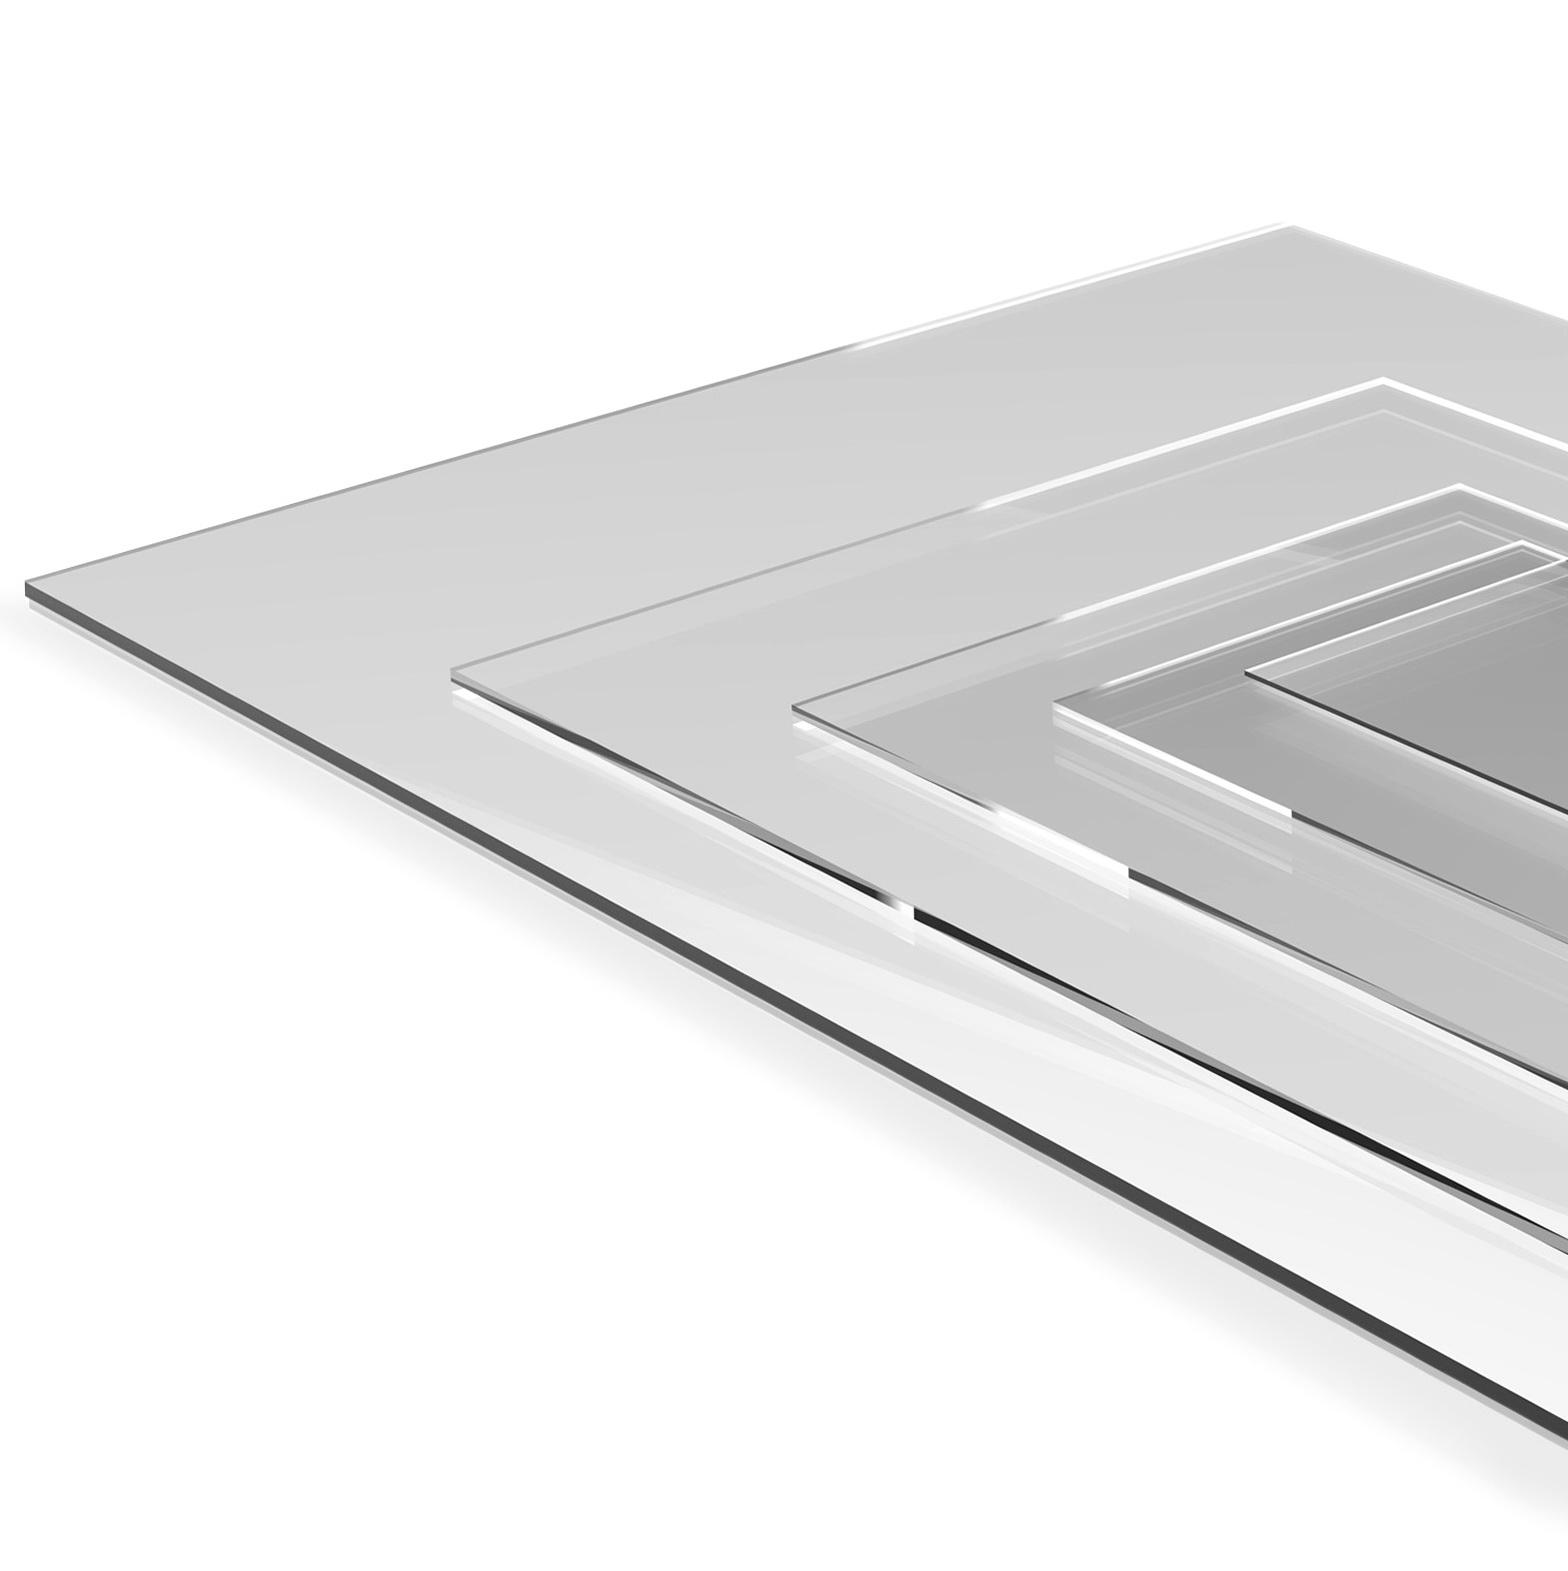 Plastic Mirror Sheets Uk Home Design Ideas